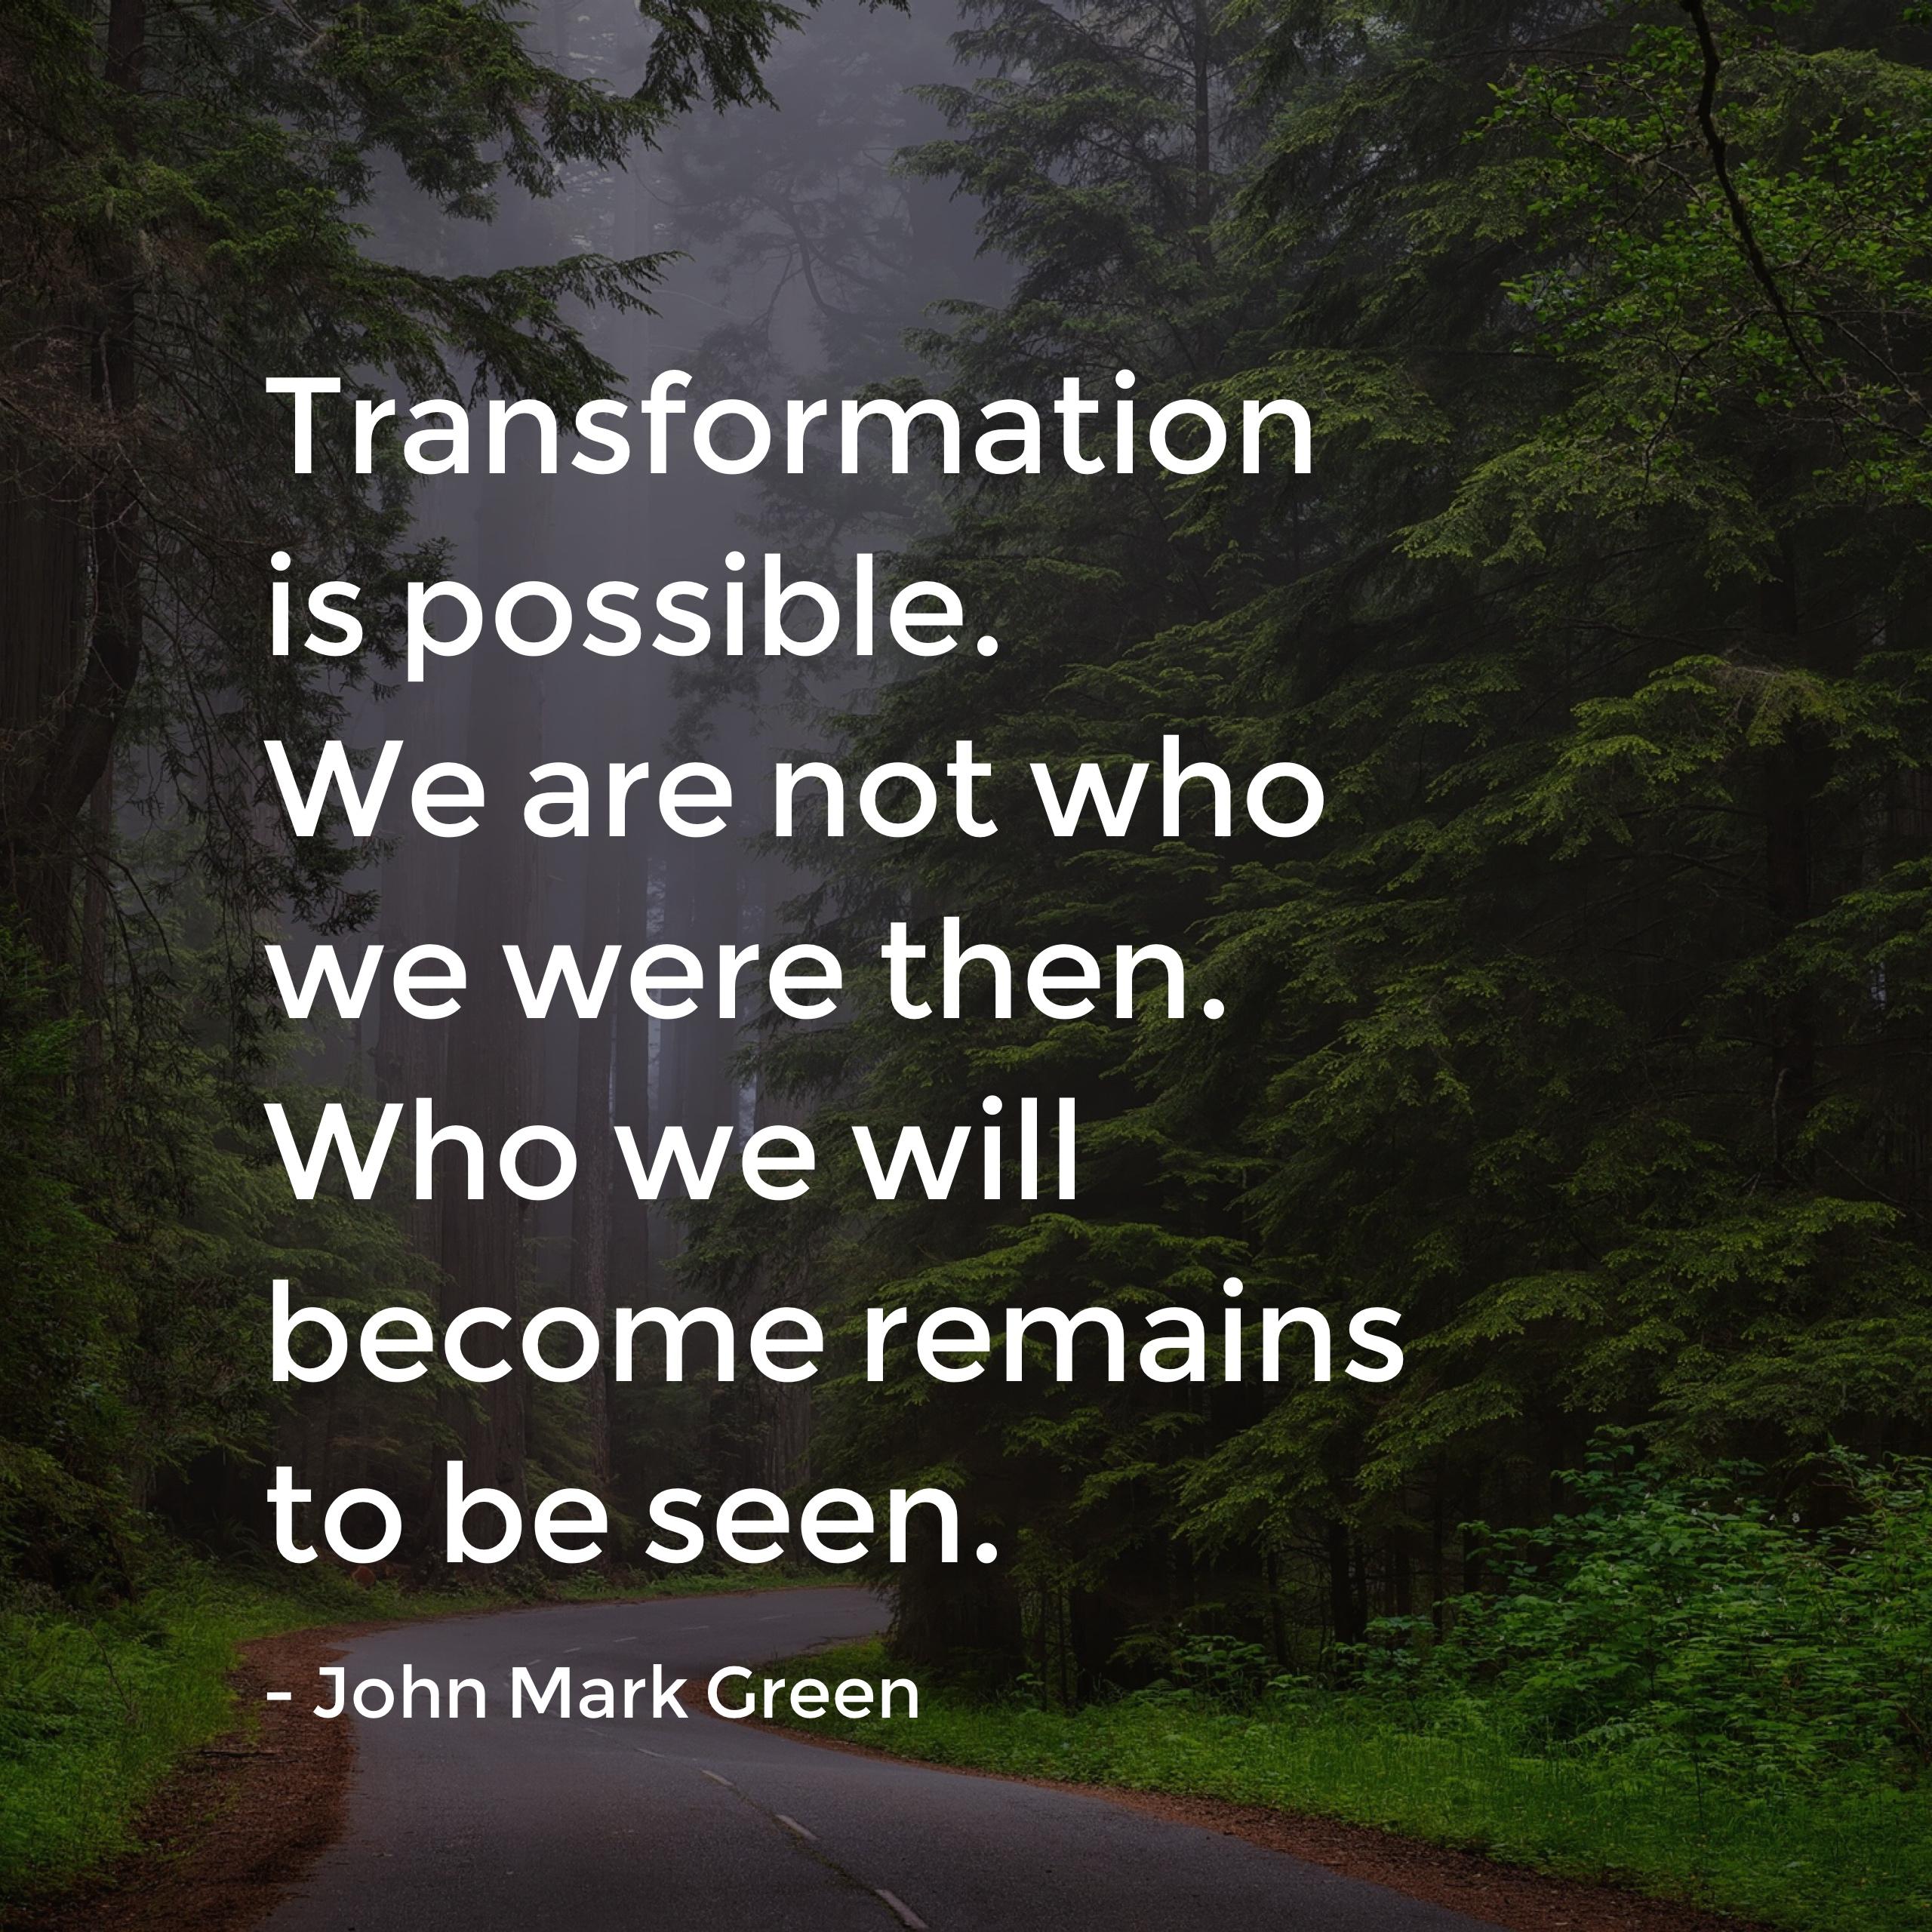 John Mark Green